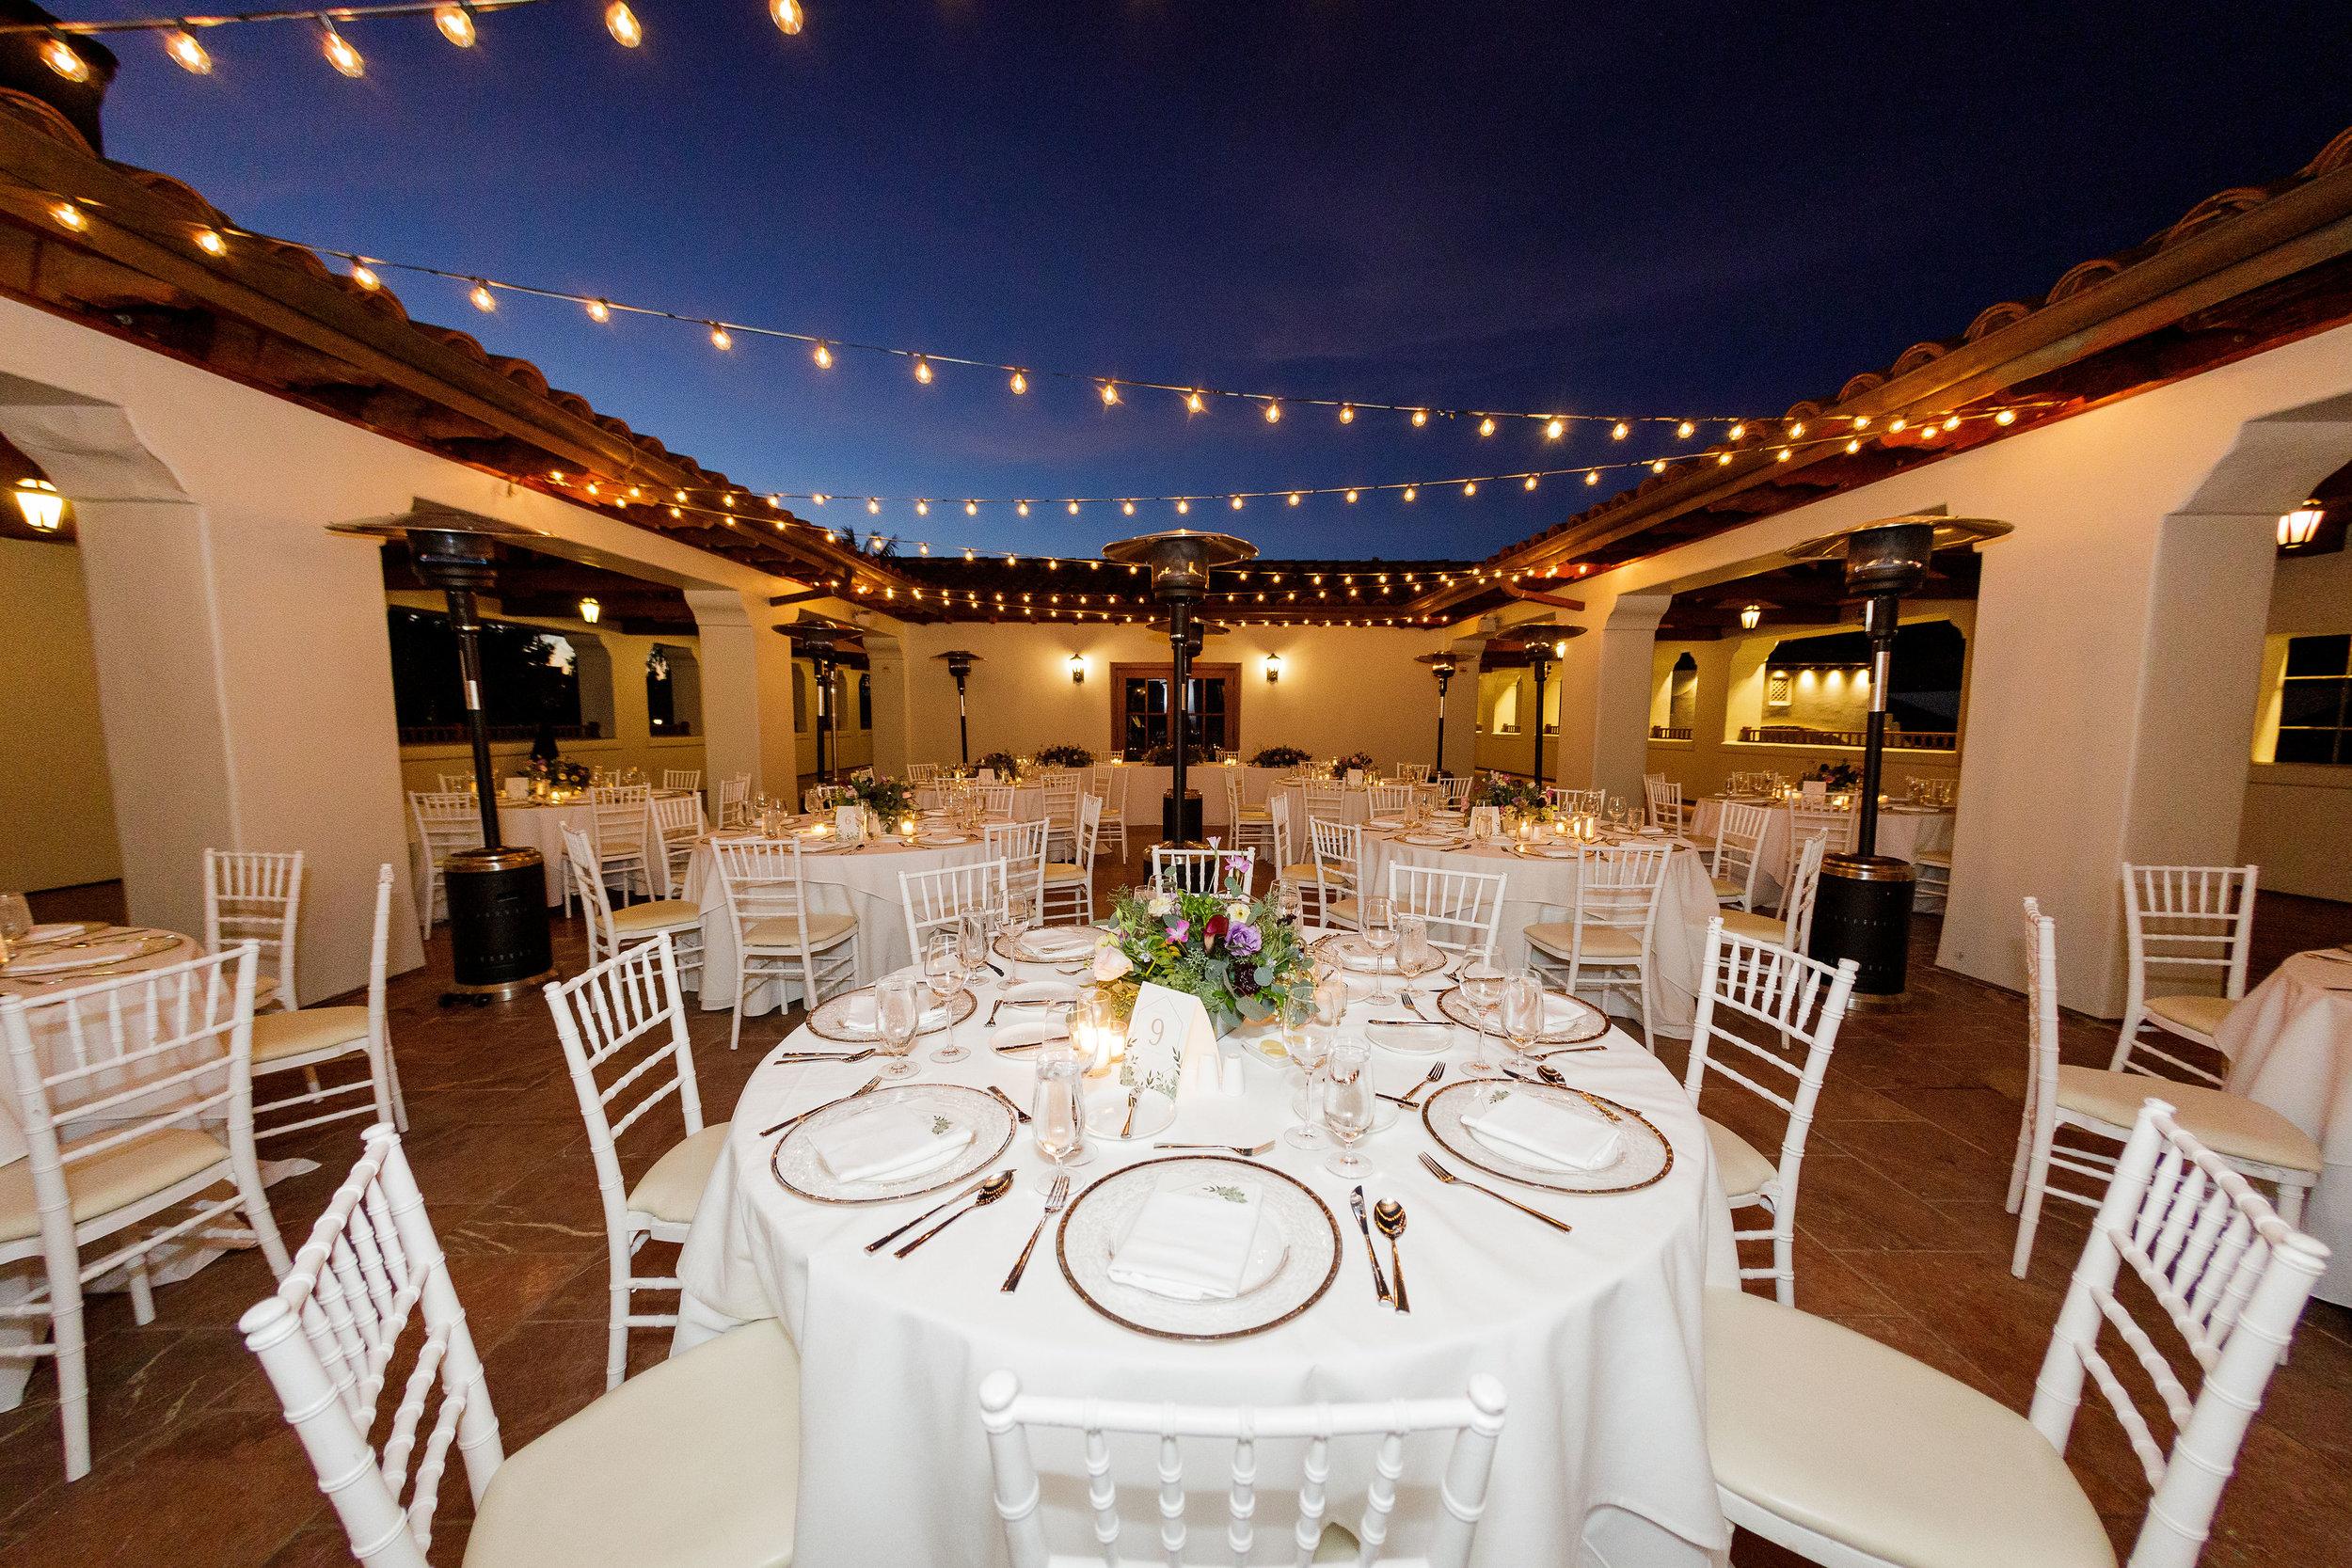 www.santabarbarawedding.com   Kiel Rucker Photography   The Ritz Carlton Bacara   Event of the Season   Cody Floral Design   Reception Tables Set Up at Night